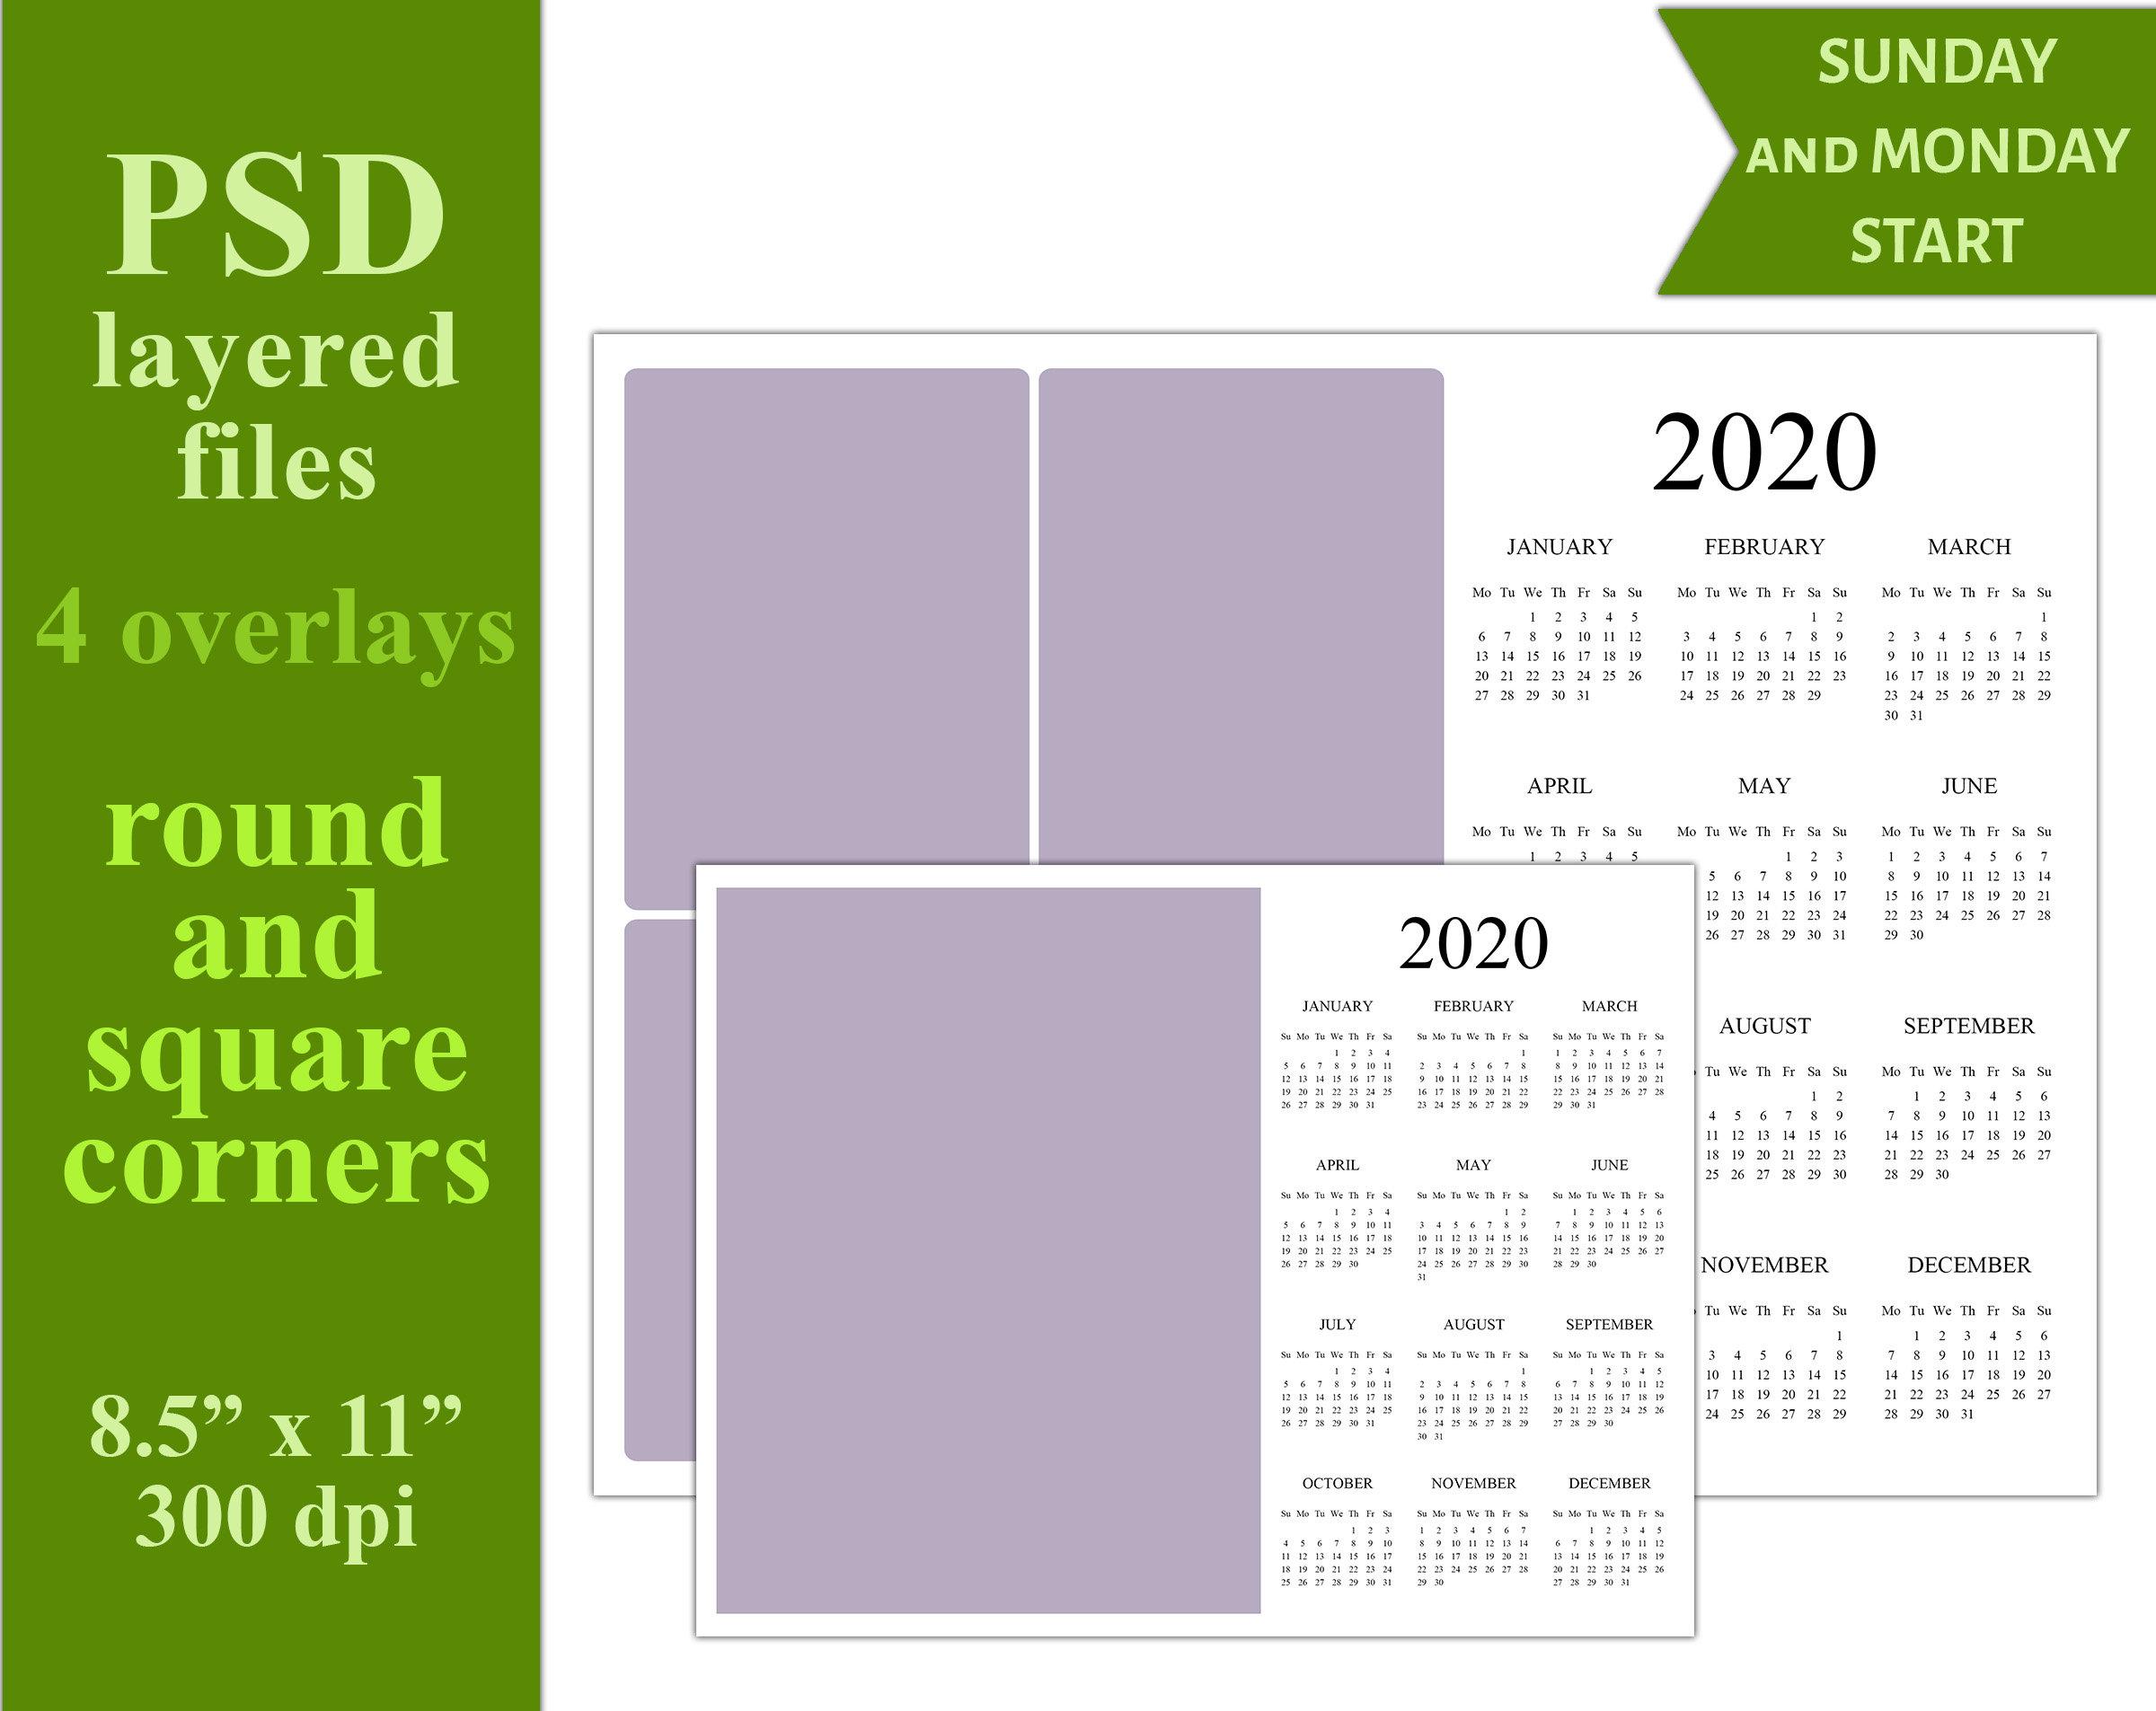 Календарь 2020 Psd – Bagno.site:rut Prediction 2020 Illinois